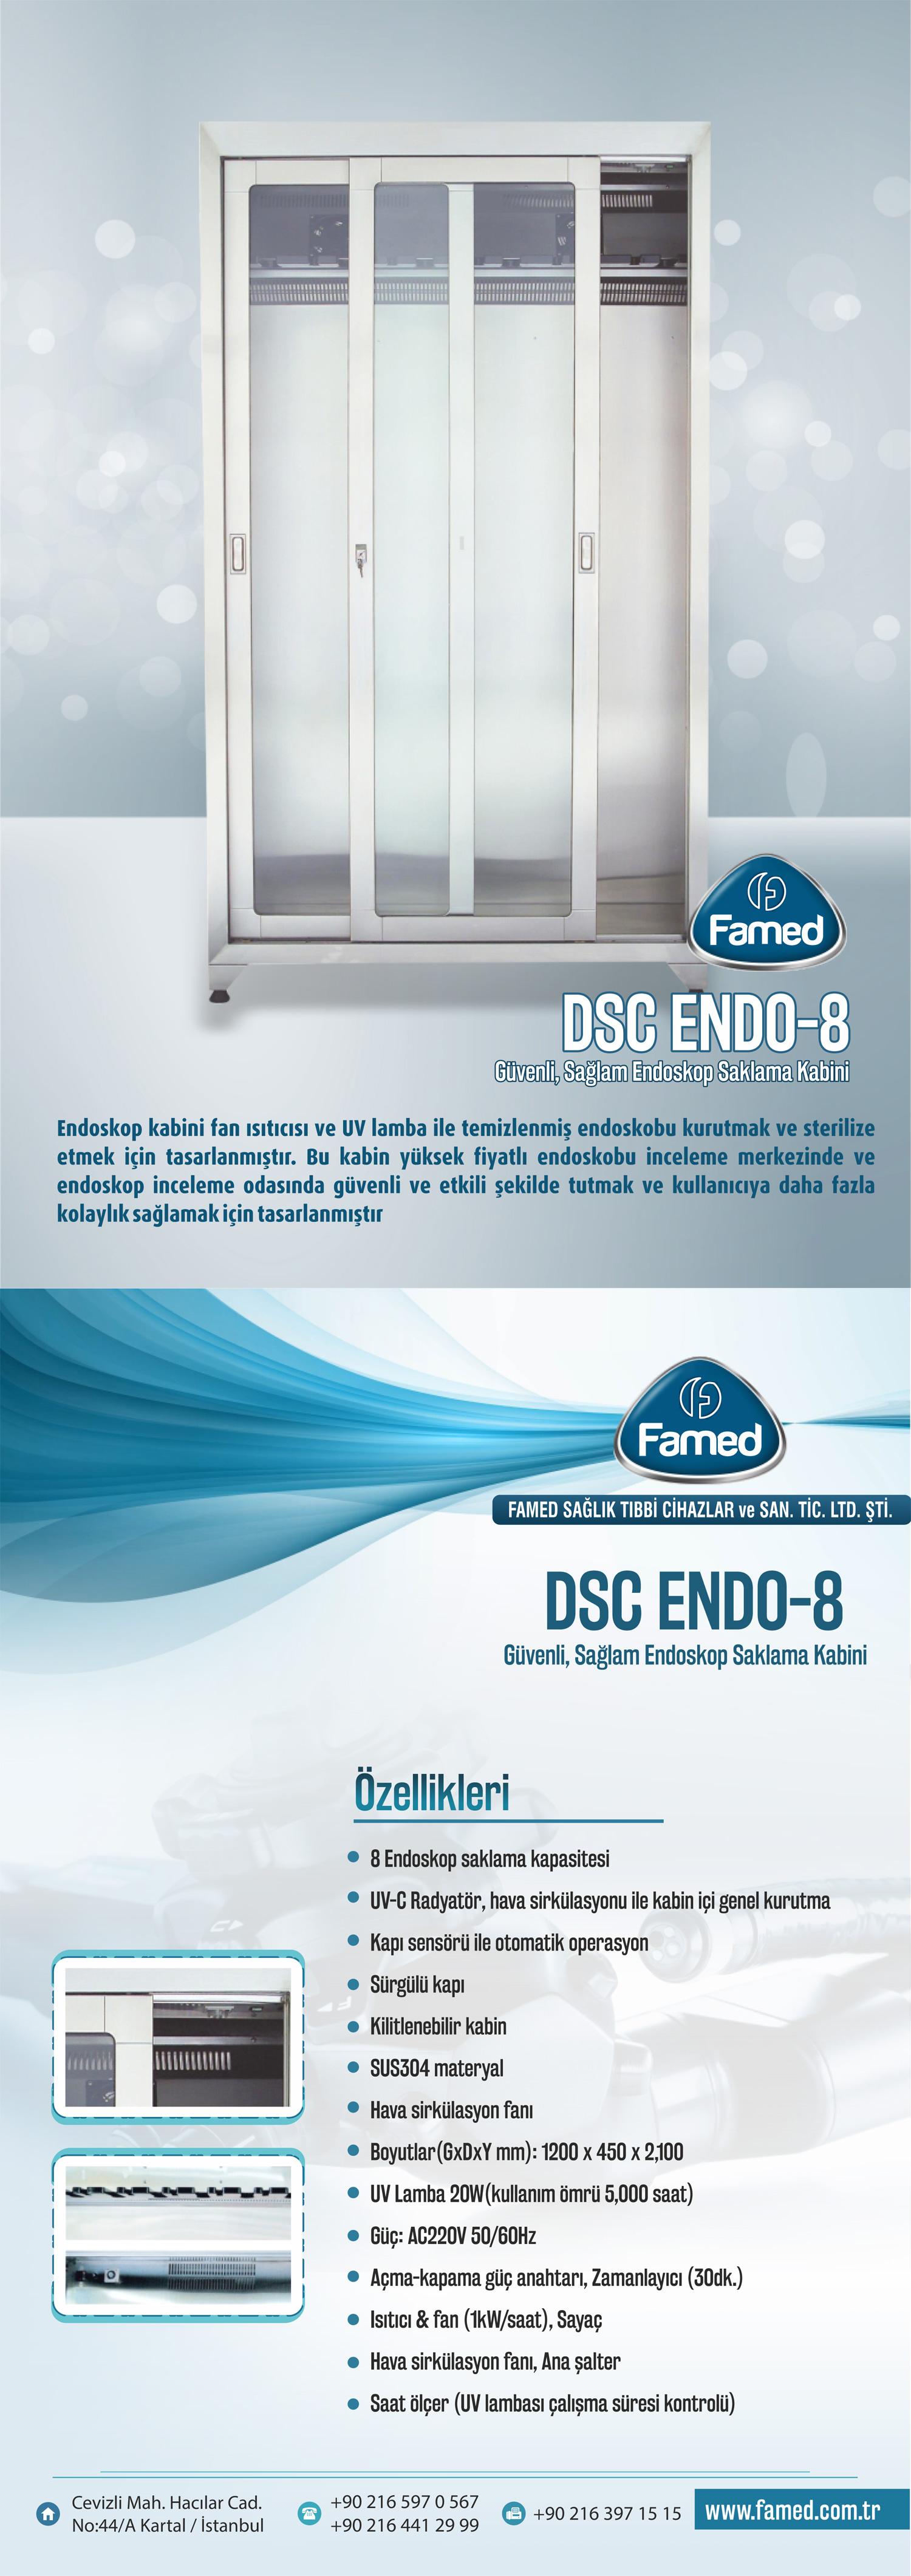 Dsc Endo-8